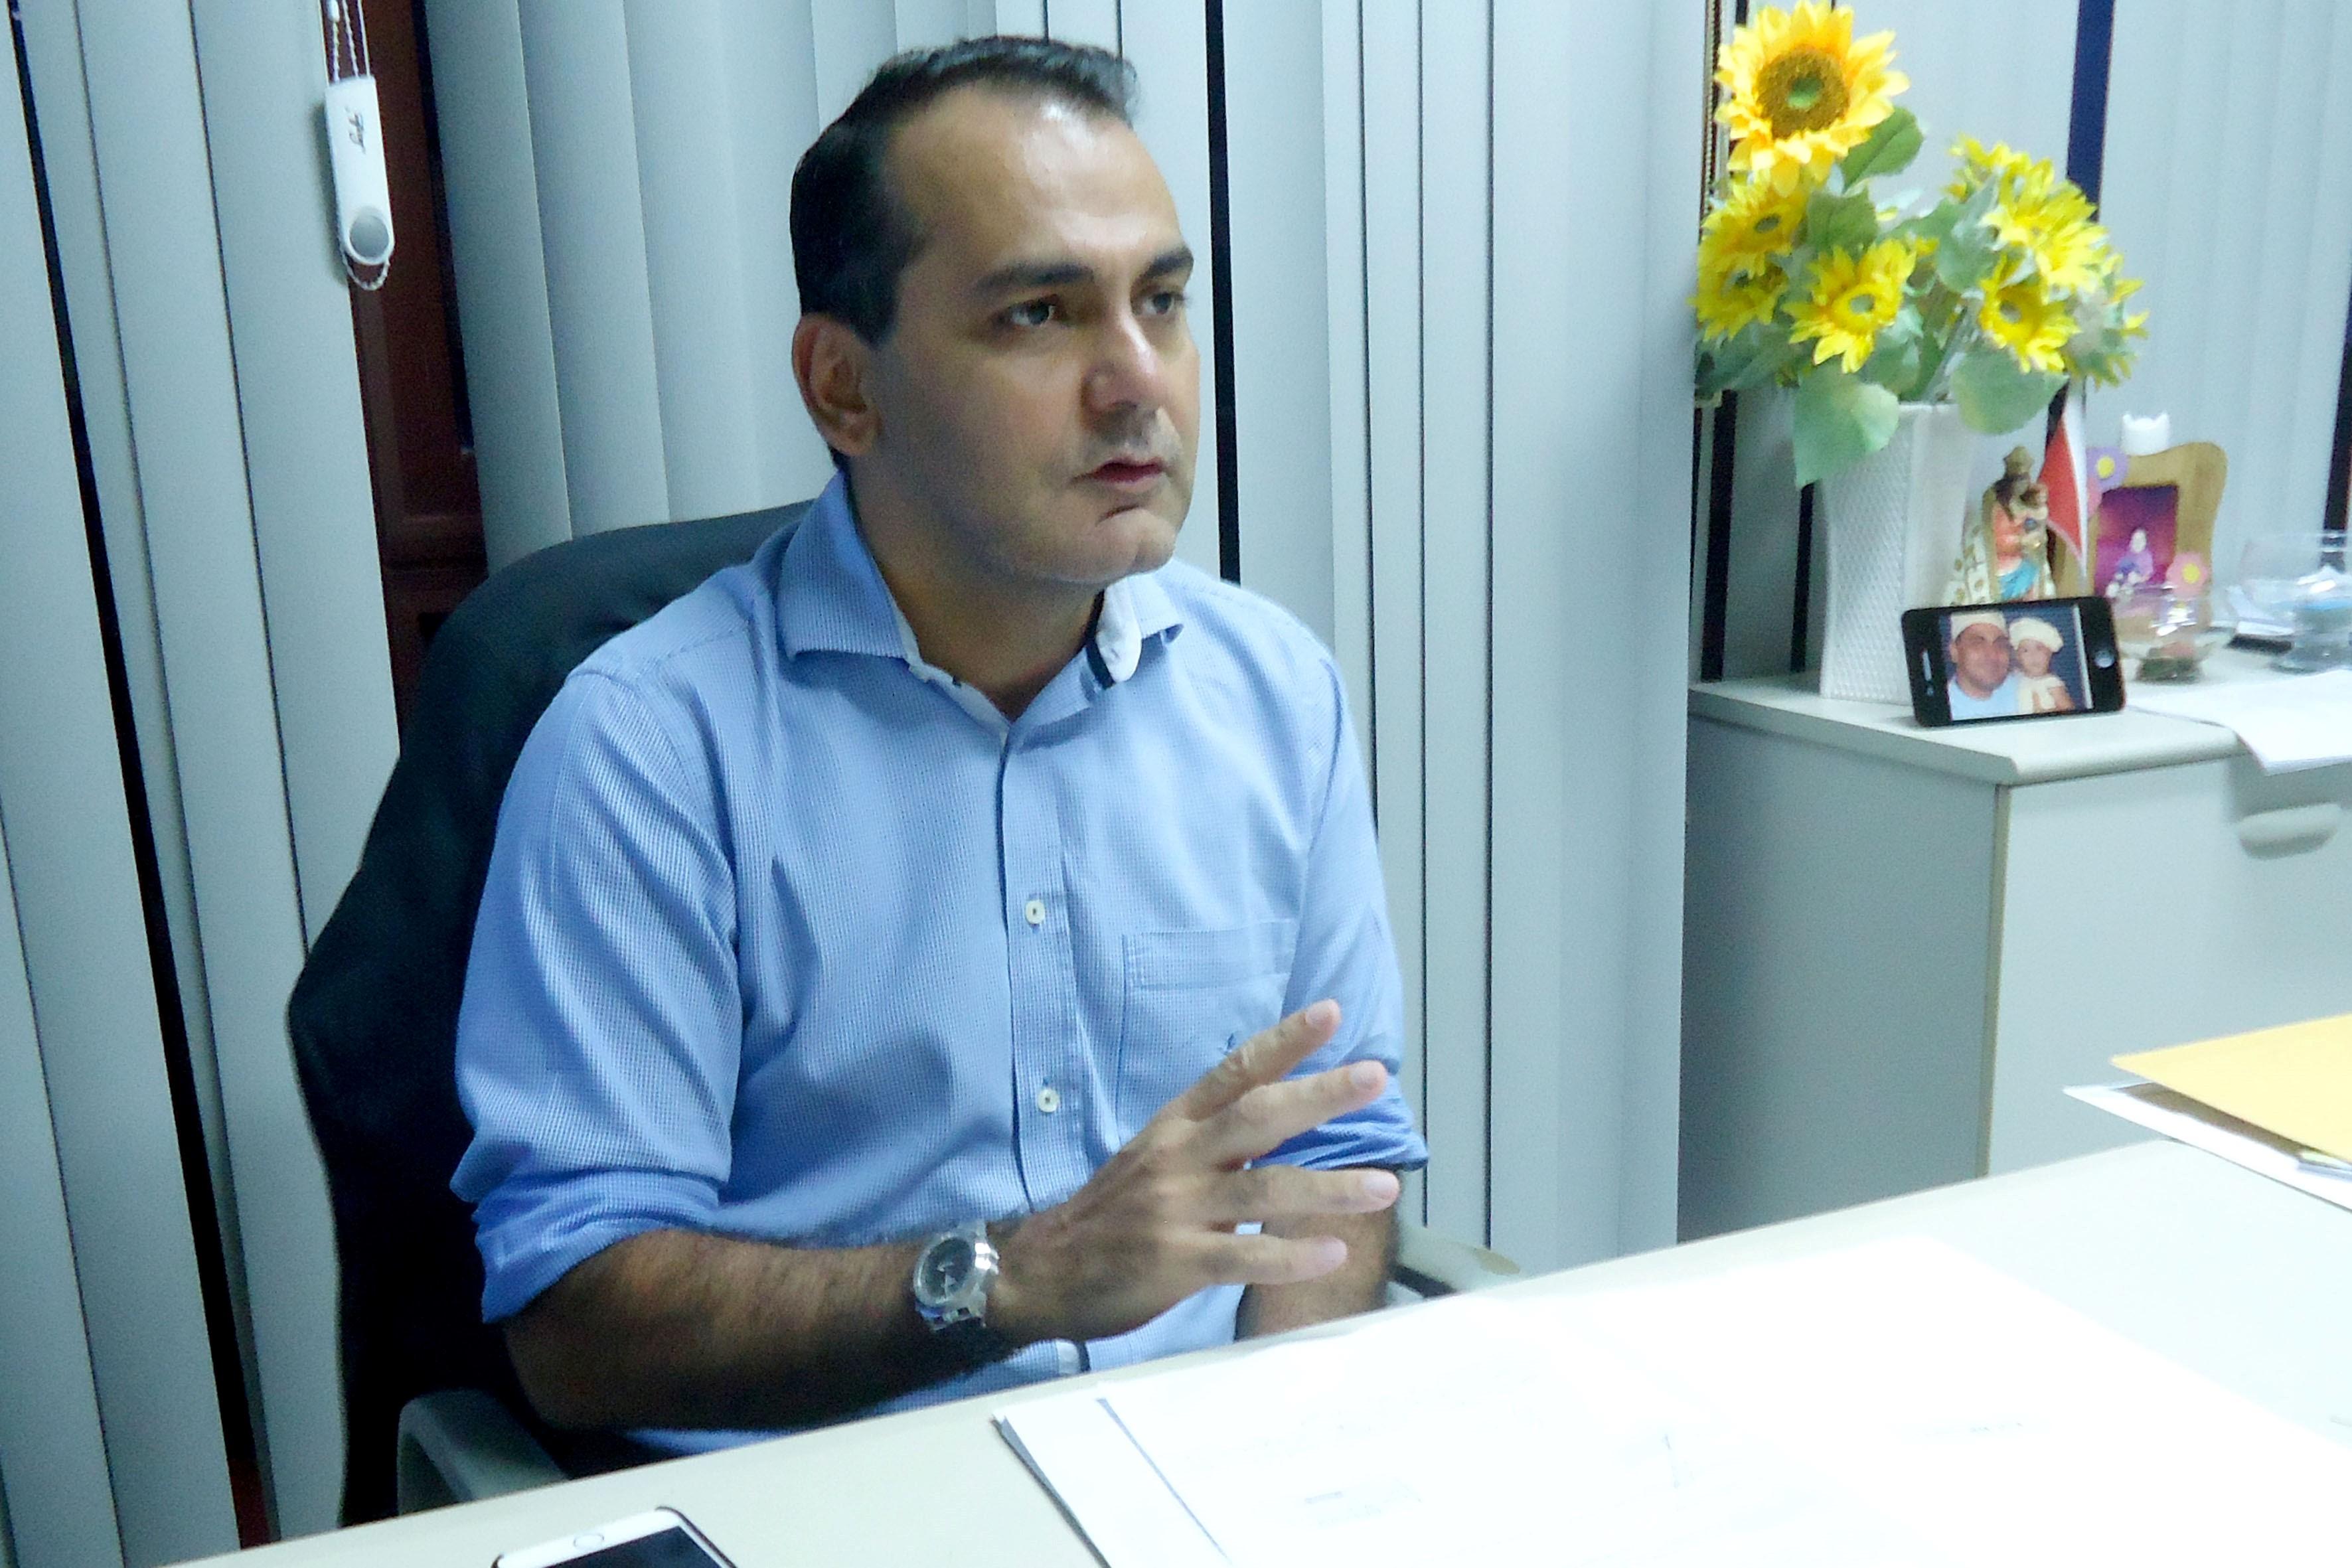 Pará – Fisco notifica contribuintes de IPVA